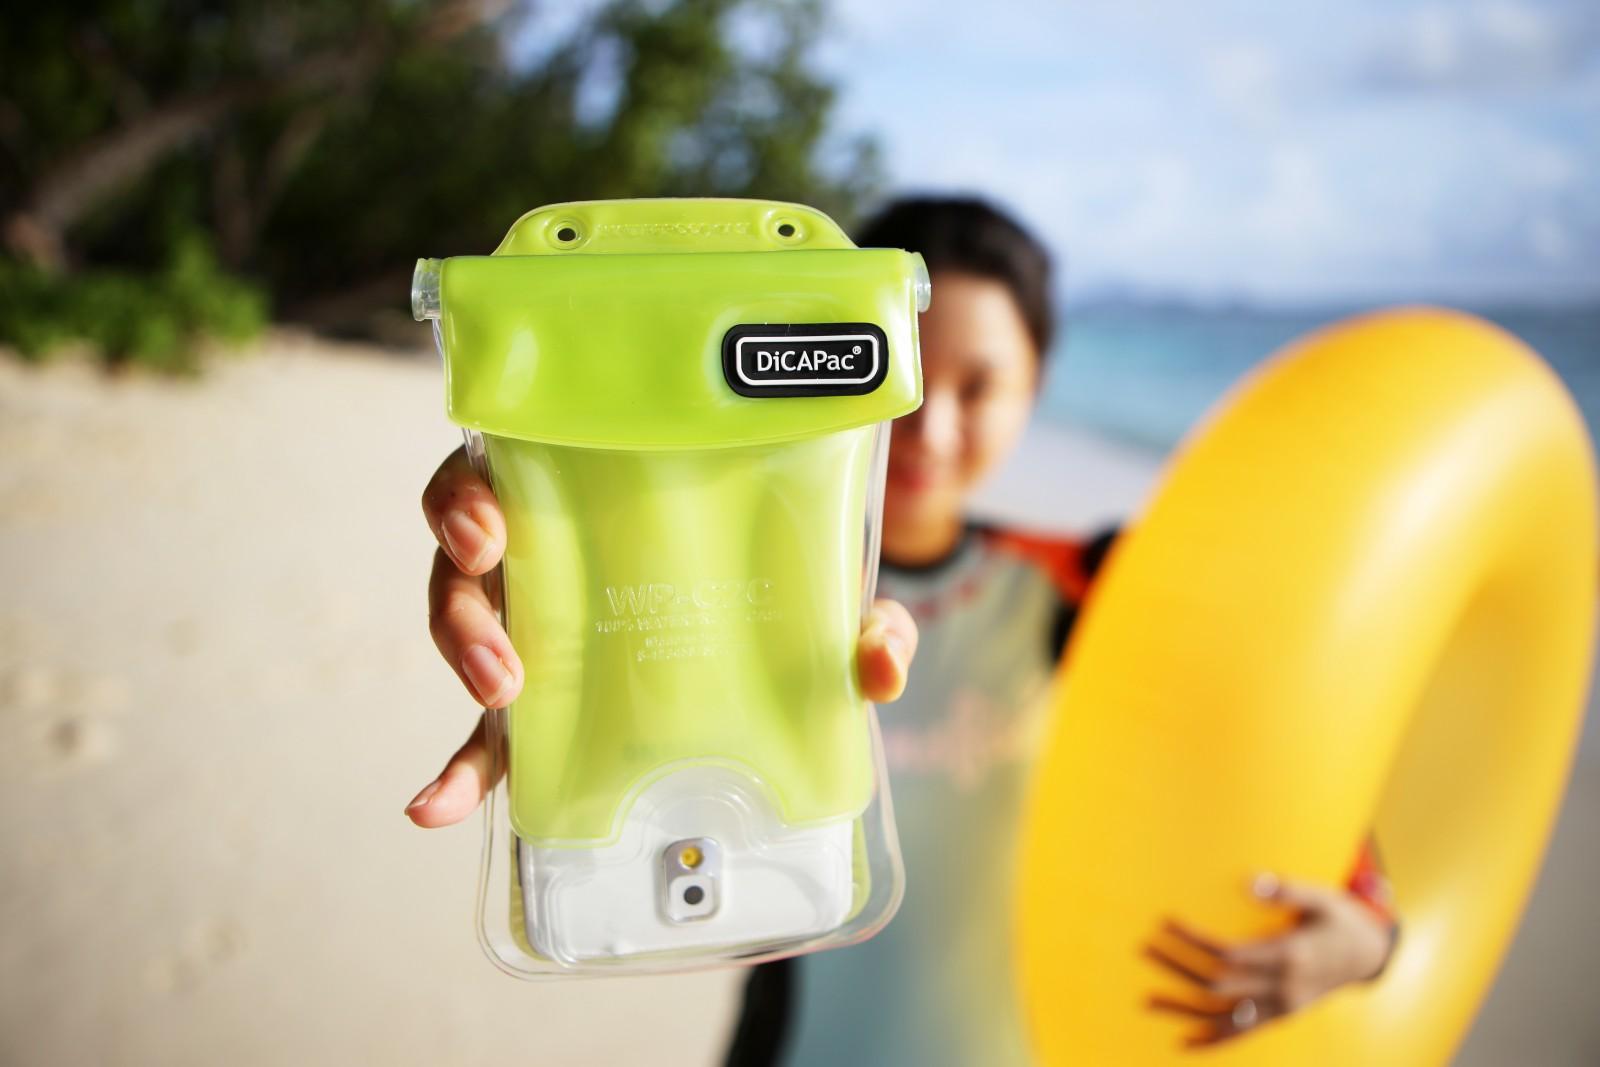 DiCAPac WP-C1s(有現貨)手機防水袋(5.1吋)-青綠色